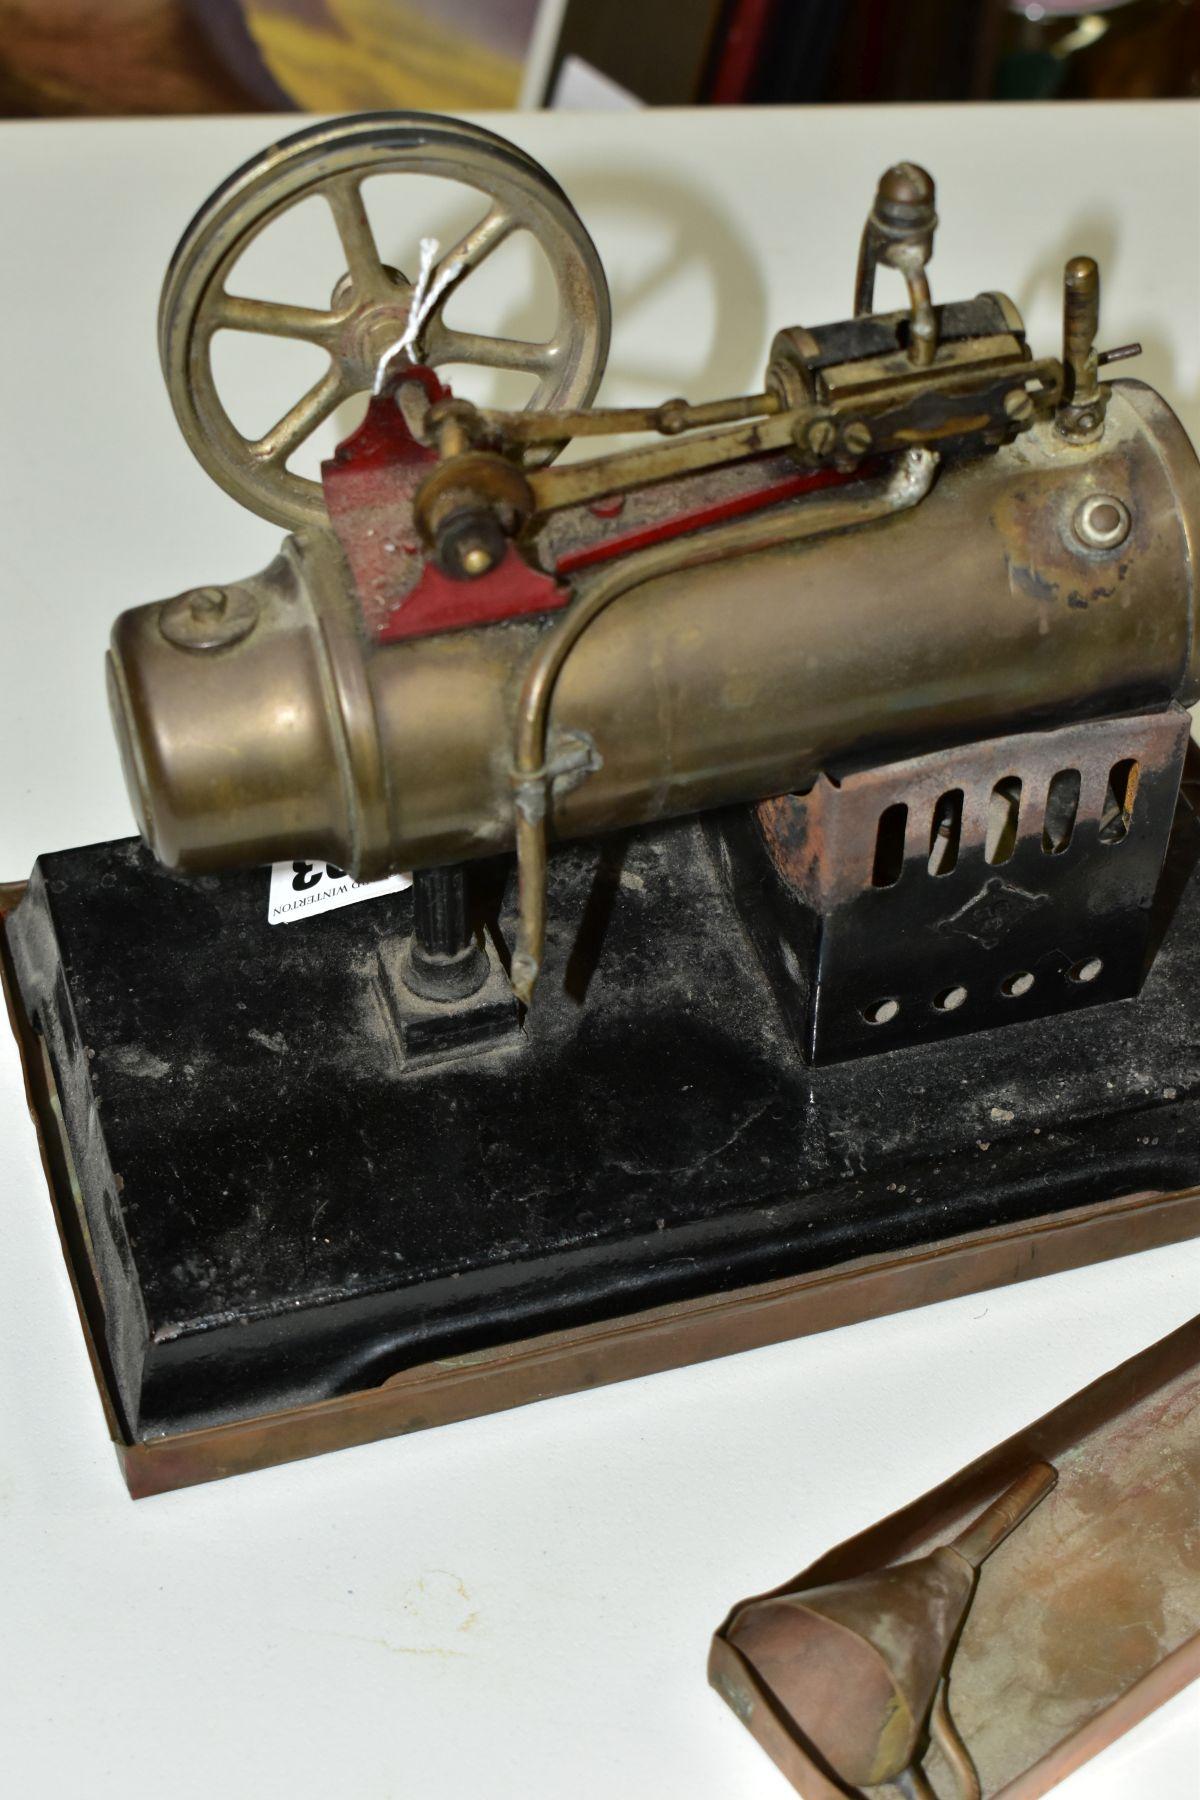 A BING HORIZONTAL LIVE STEAM ENGINE, not tested, horizontal boiler powering a flywheel (diameter - Image 4 of 6